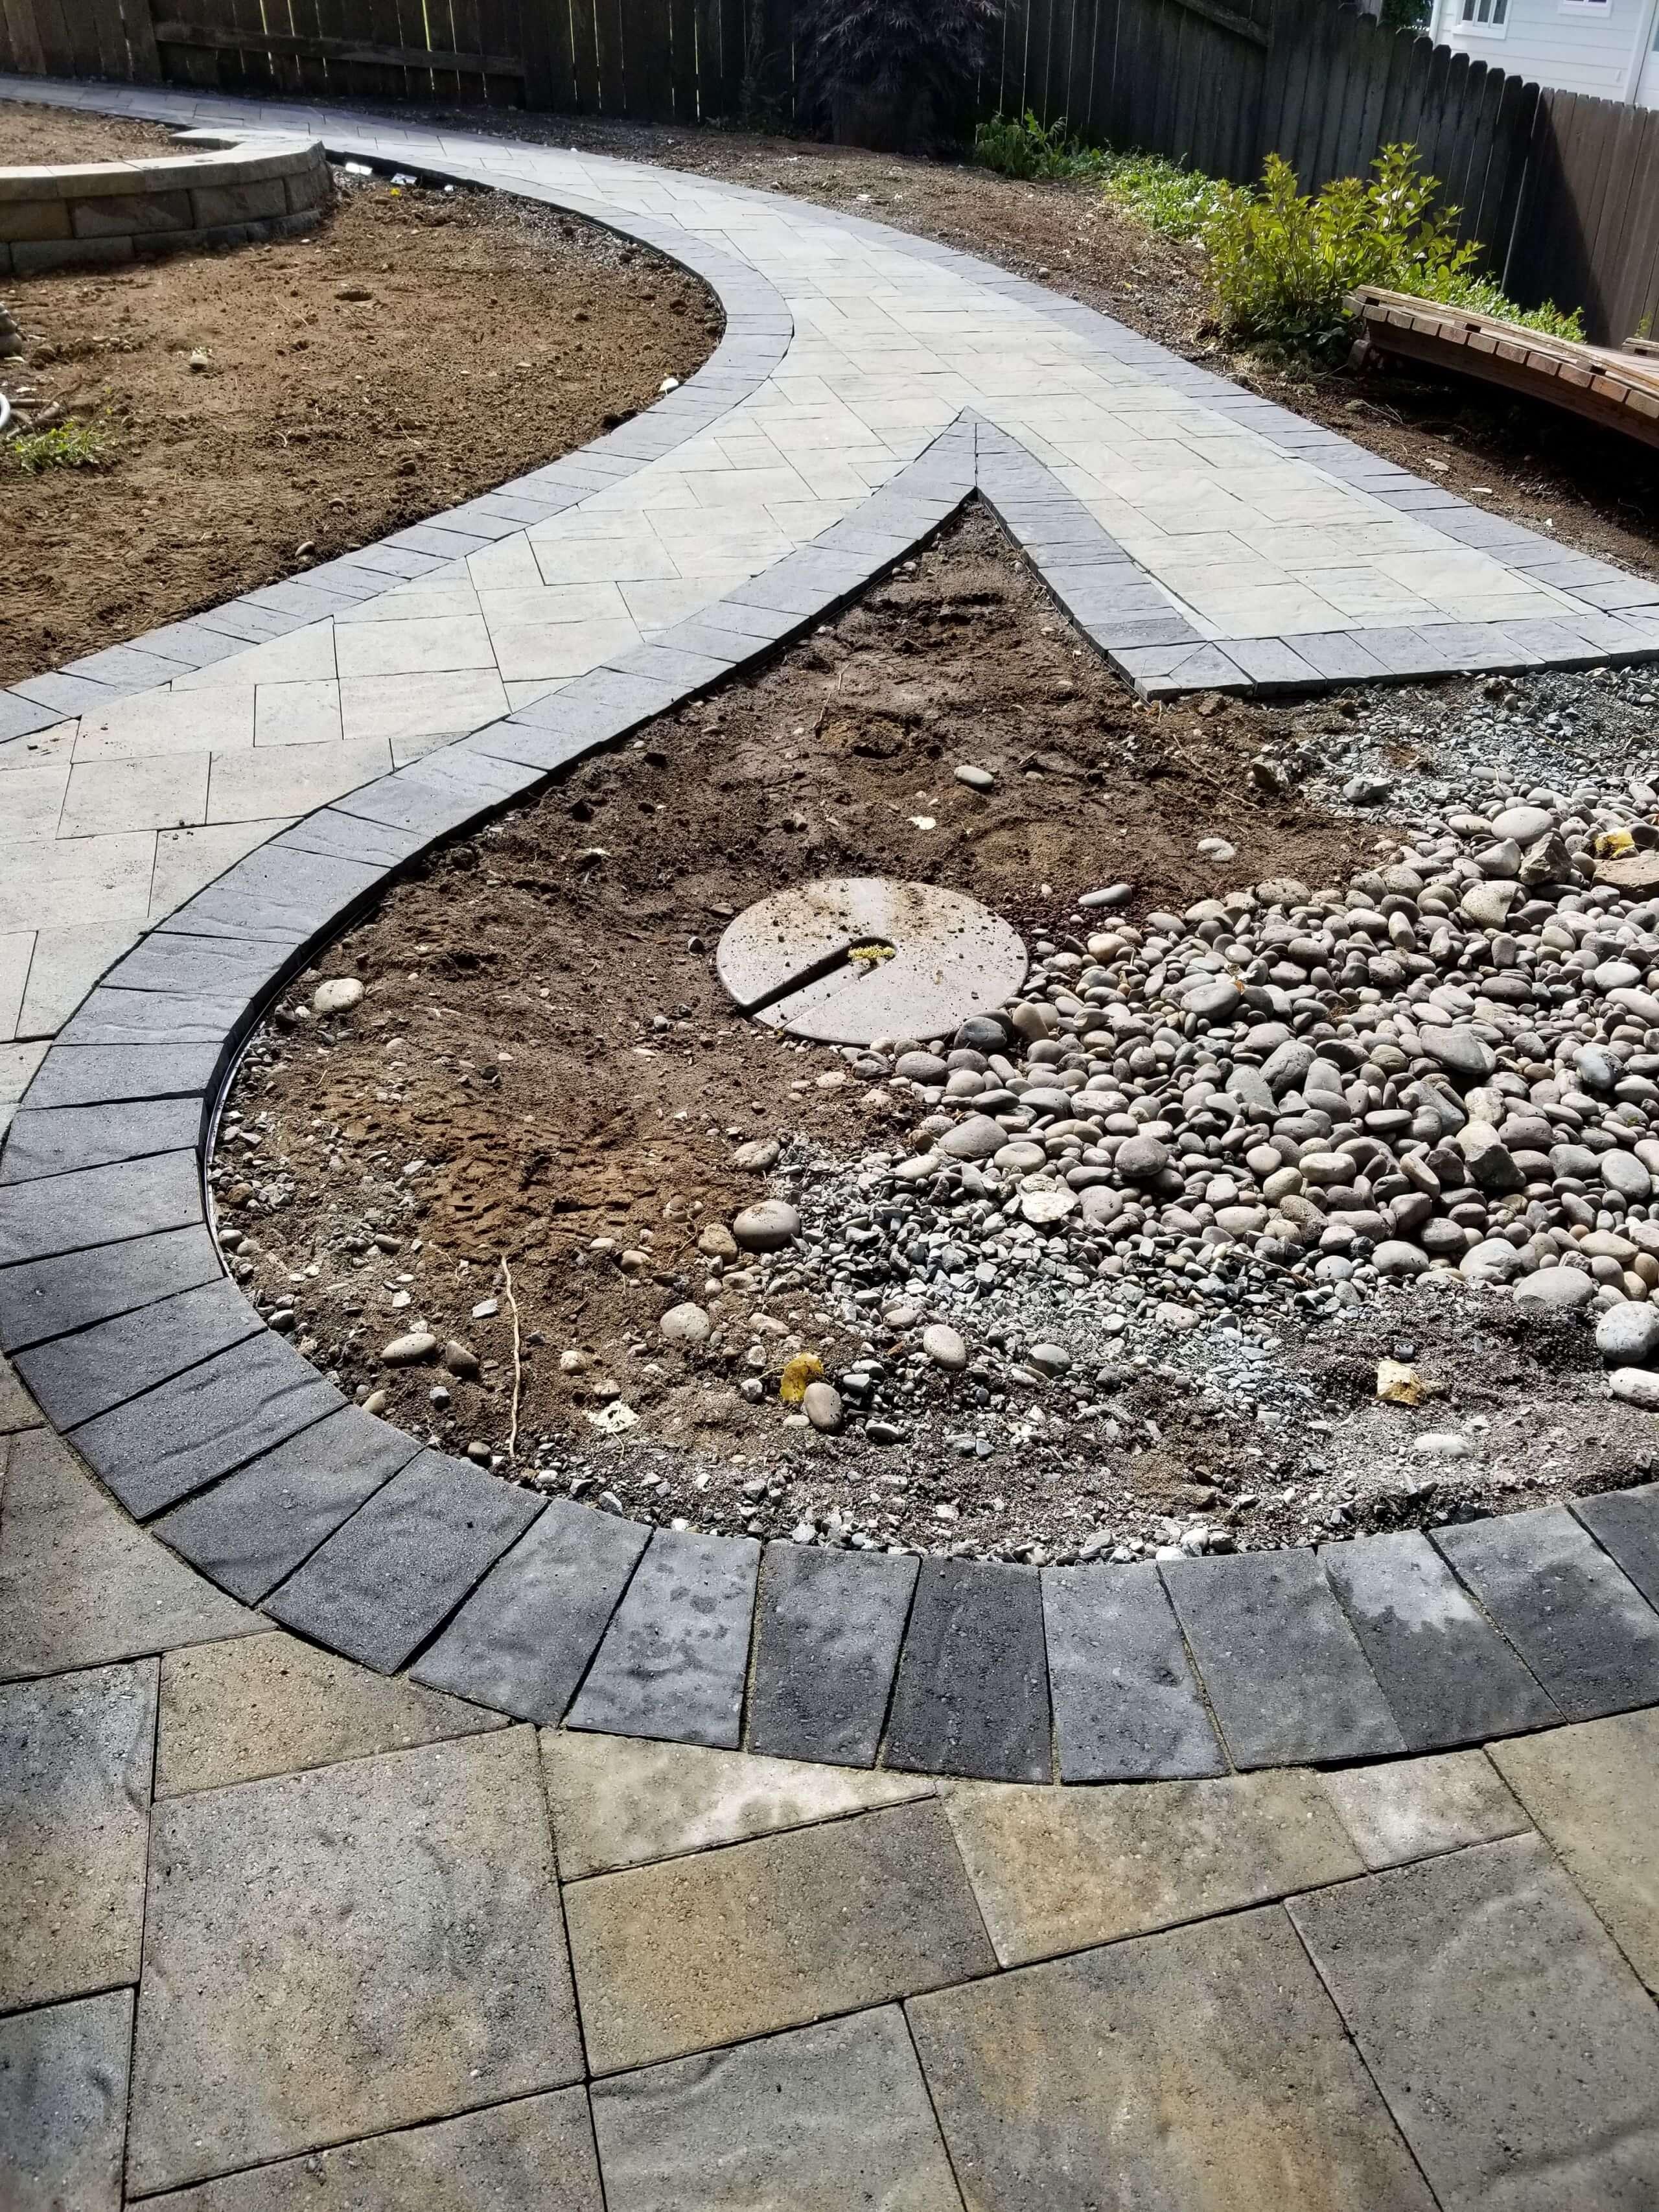 https://shovelandthumb.sfo3.digitaloceanspaces.com/patios walkways/walkway 13